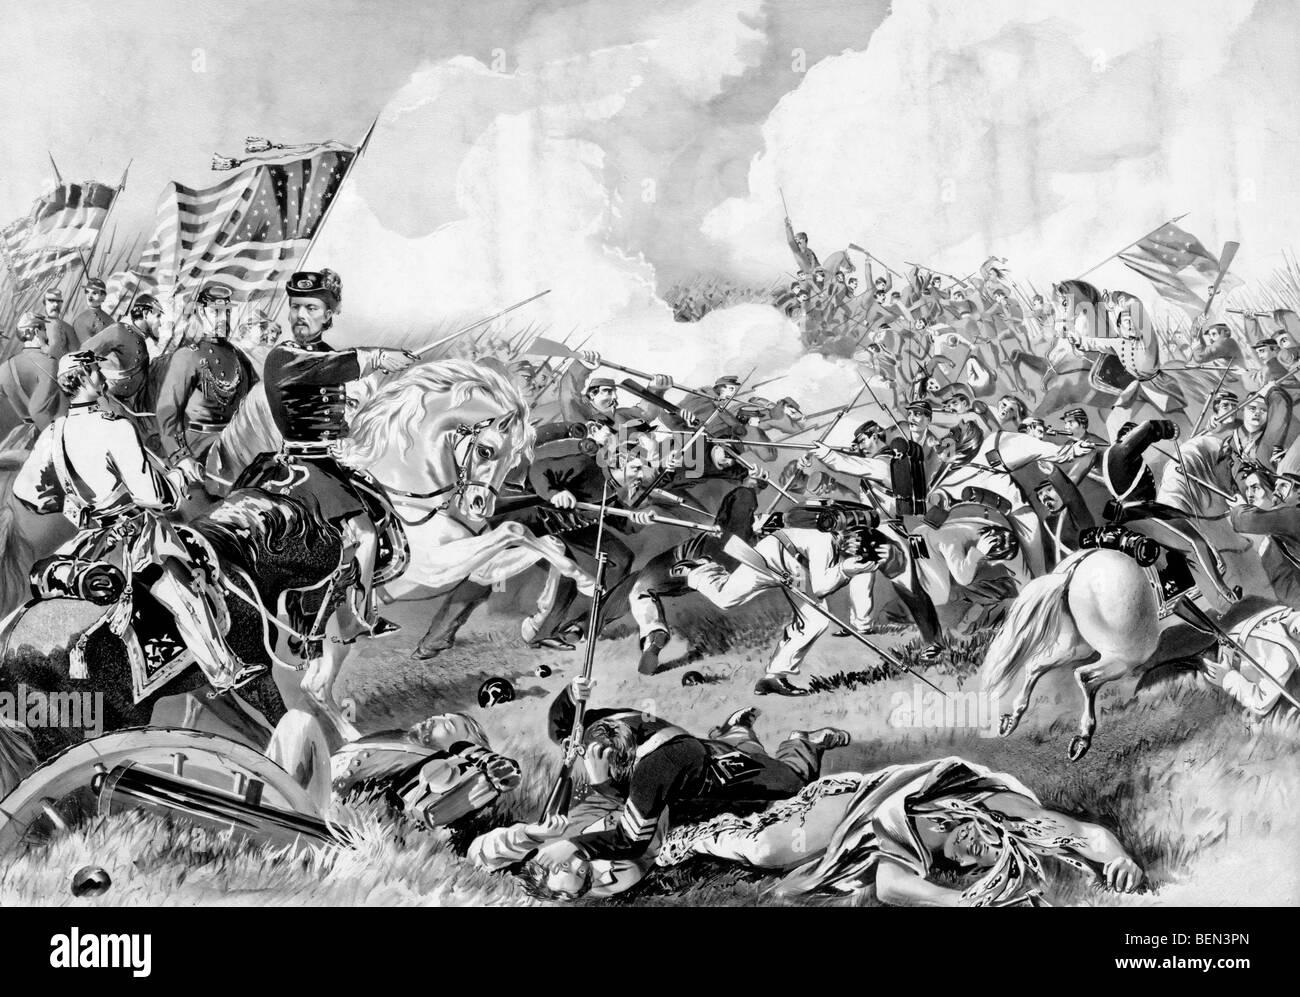 Battle of Pea Ridge, Arkansas, March 8th 1862 in the American Civil War - Stock Image